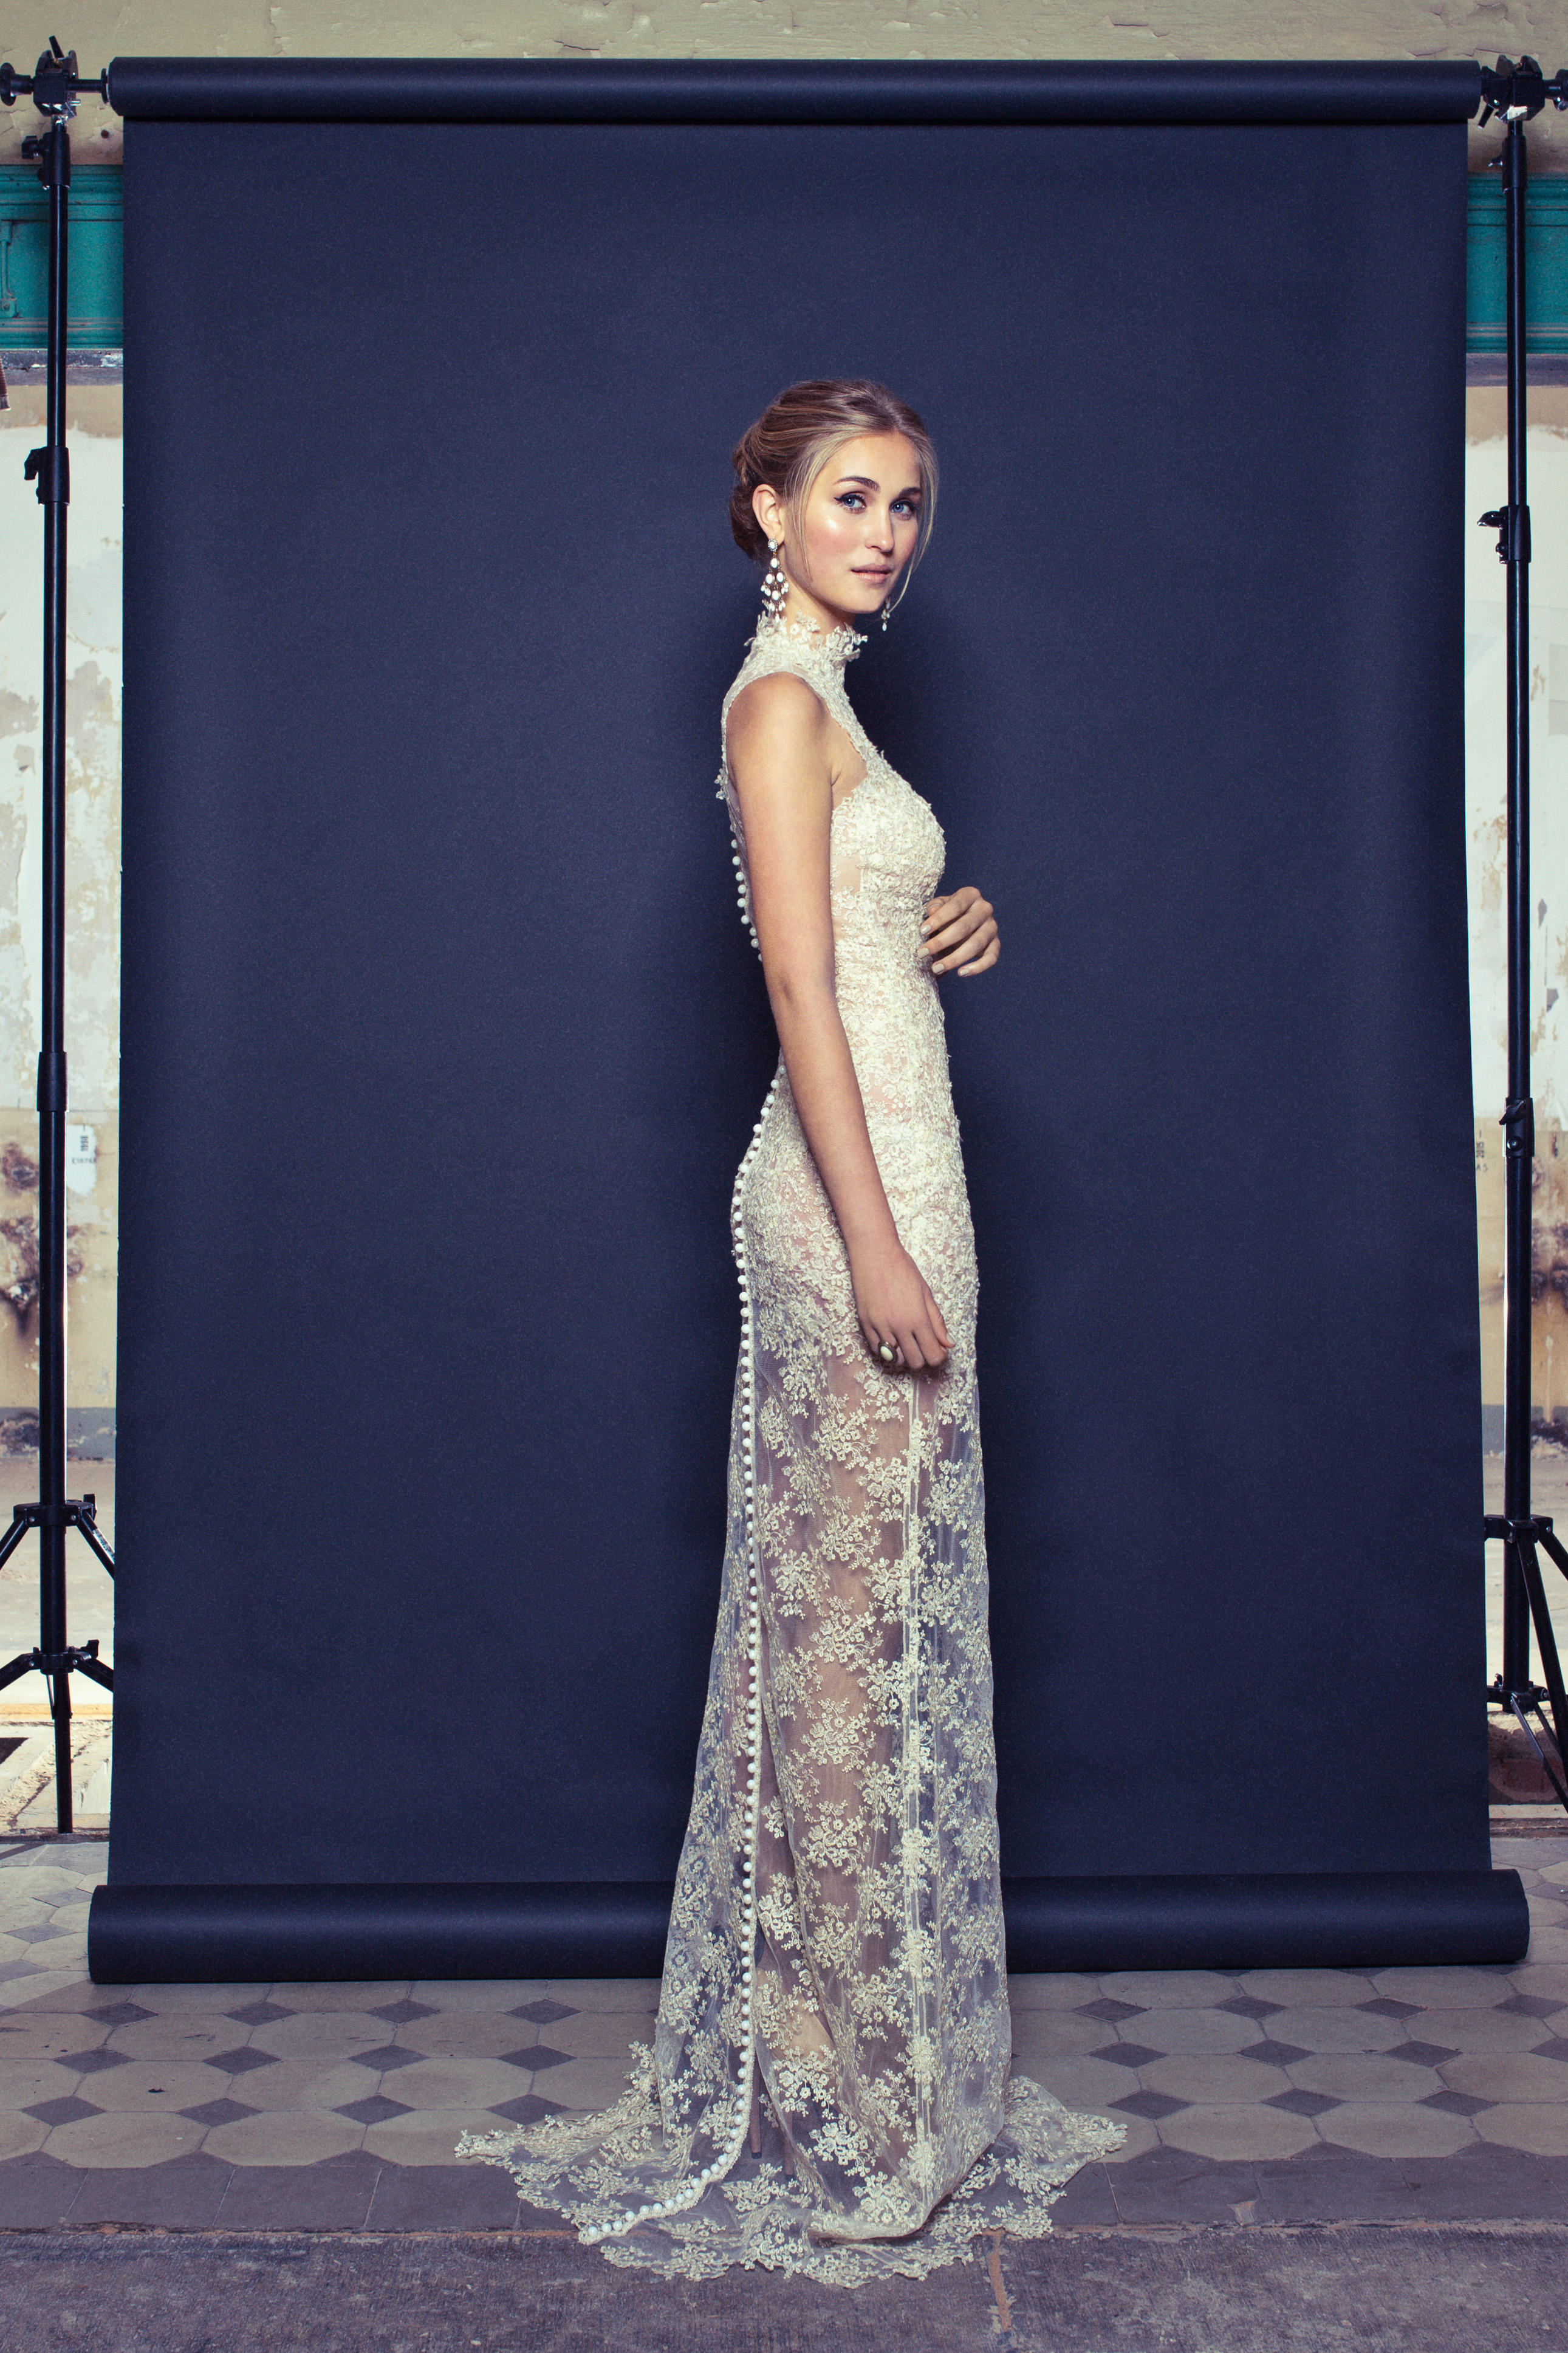 131019-3Zehn-Haute-Couture-Maria-Dolores